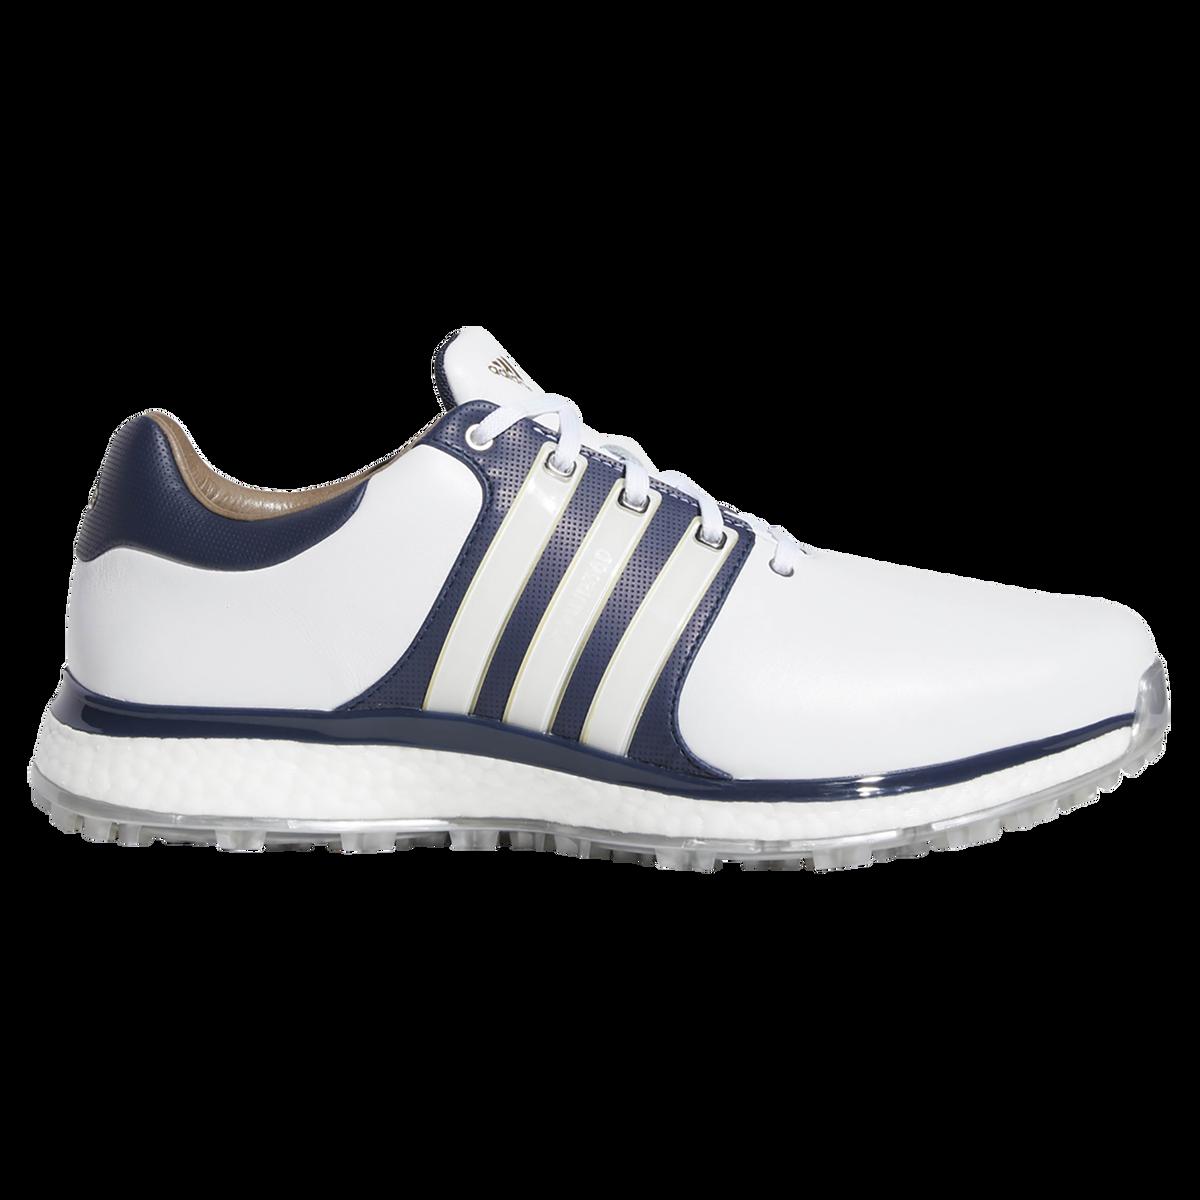 a3a3a469c60 adidas TOUR360 XT-SL Men s Golf Shoe - White Navy